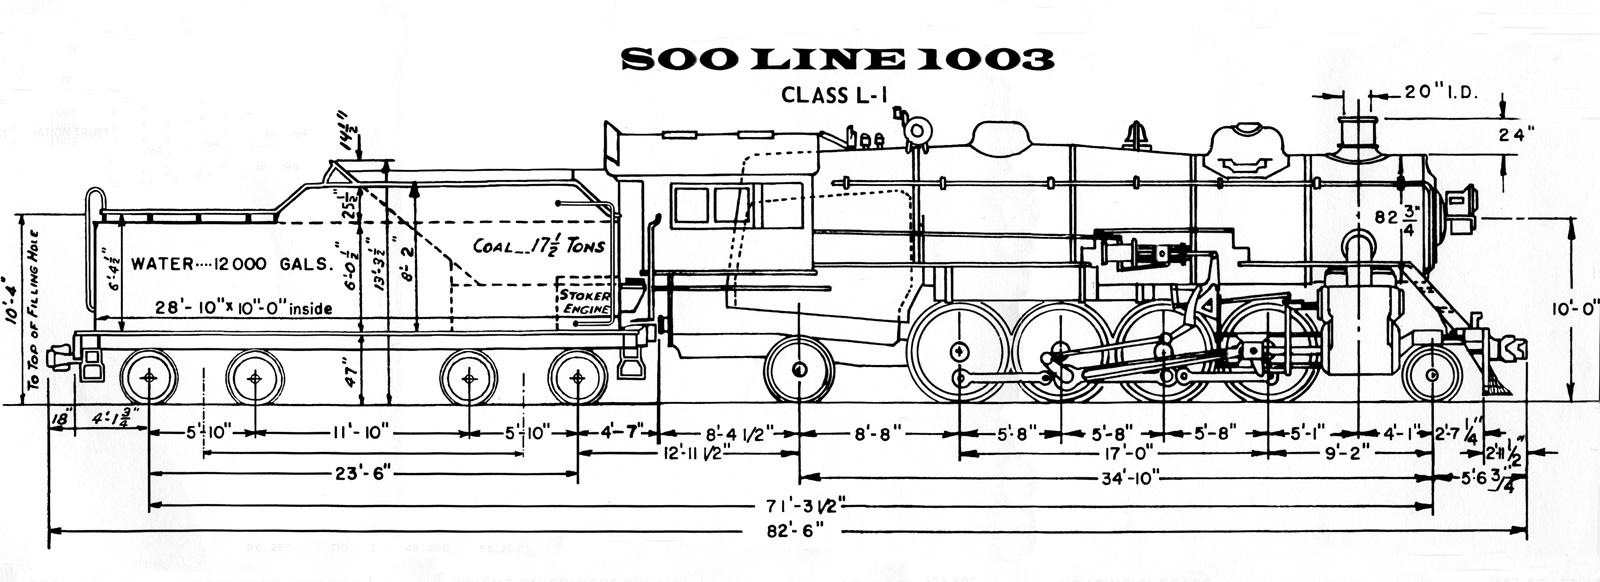 hight resolution of soo line 1003 steam locomotive heritage association ge locomotive cab locomotive cab diagram